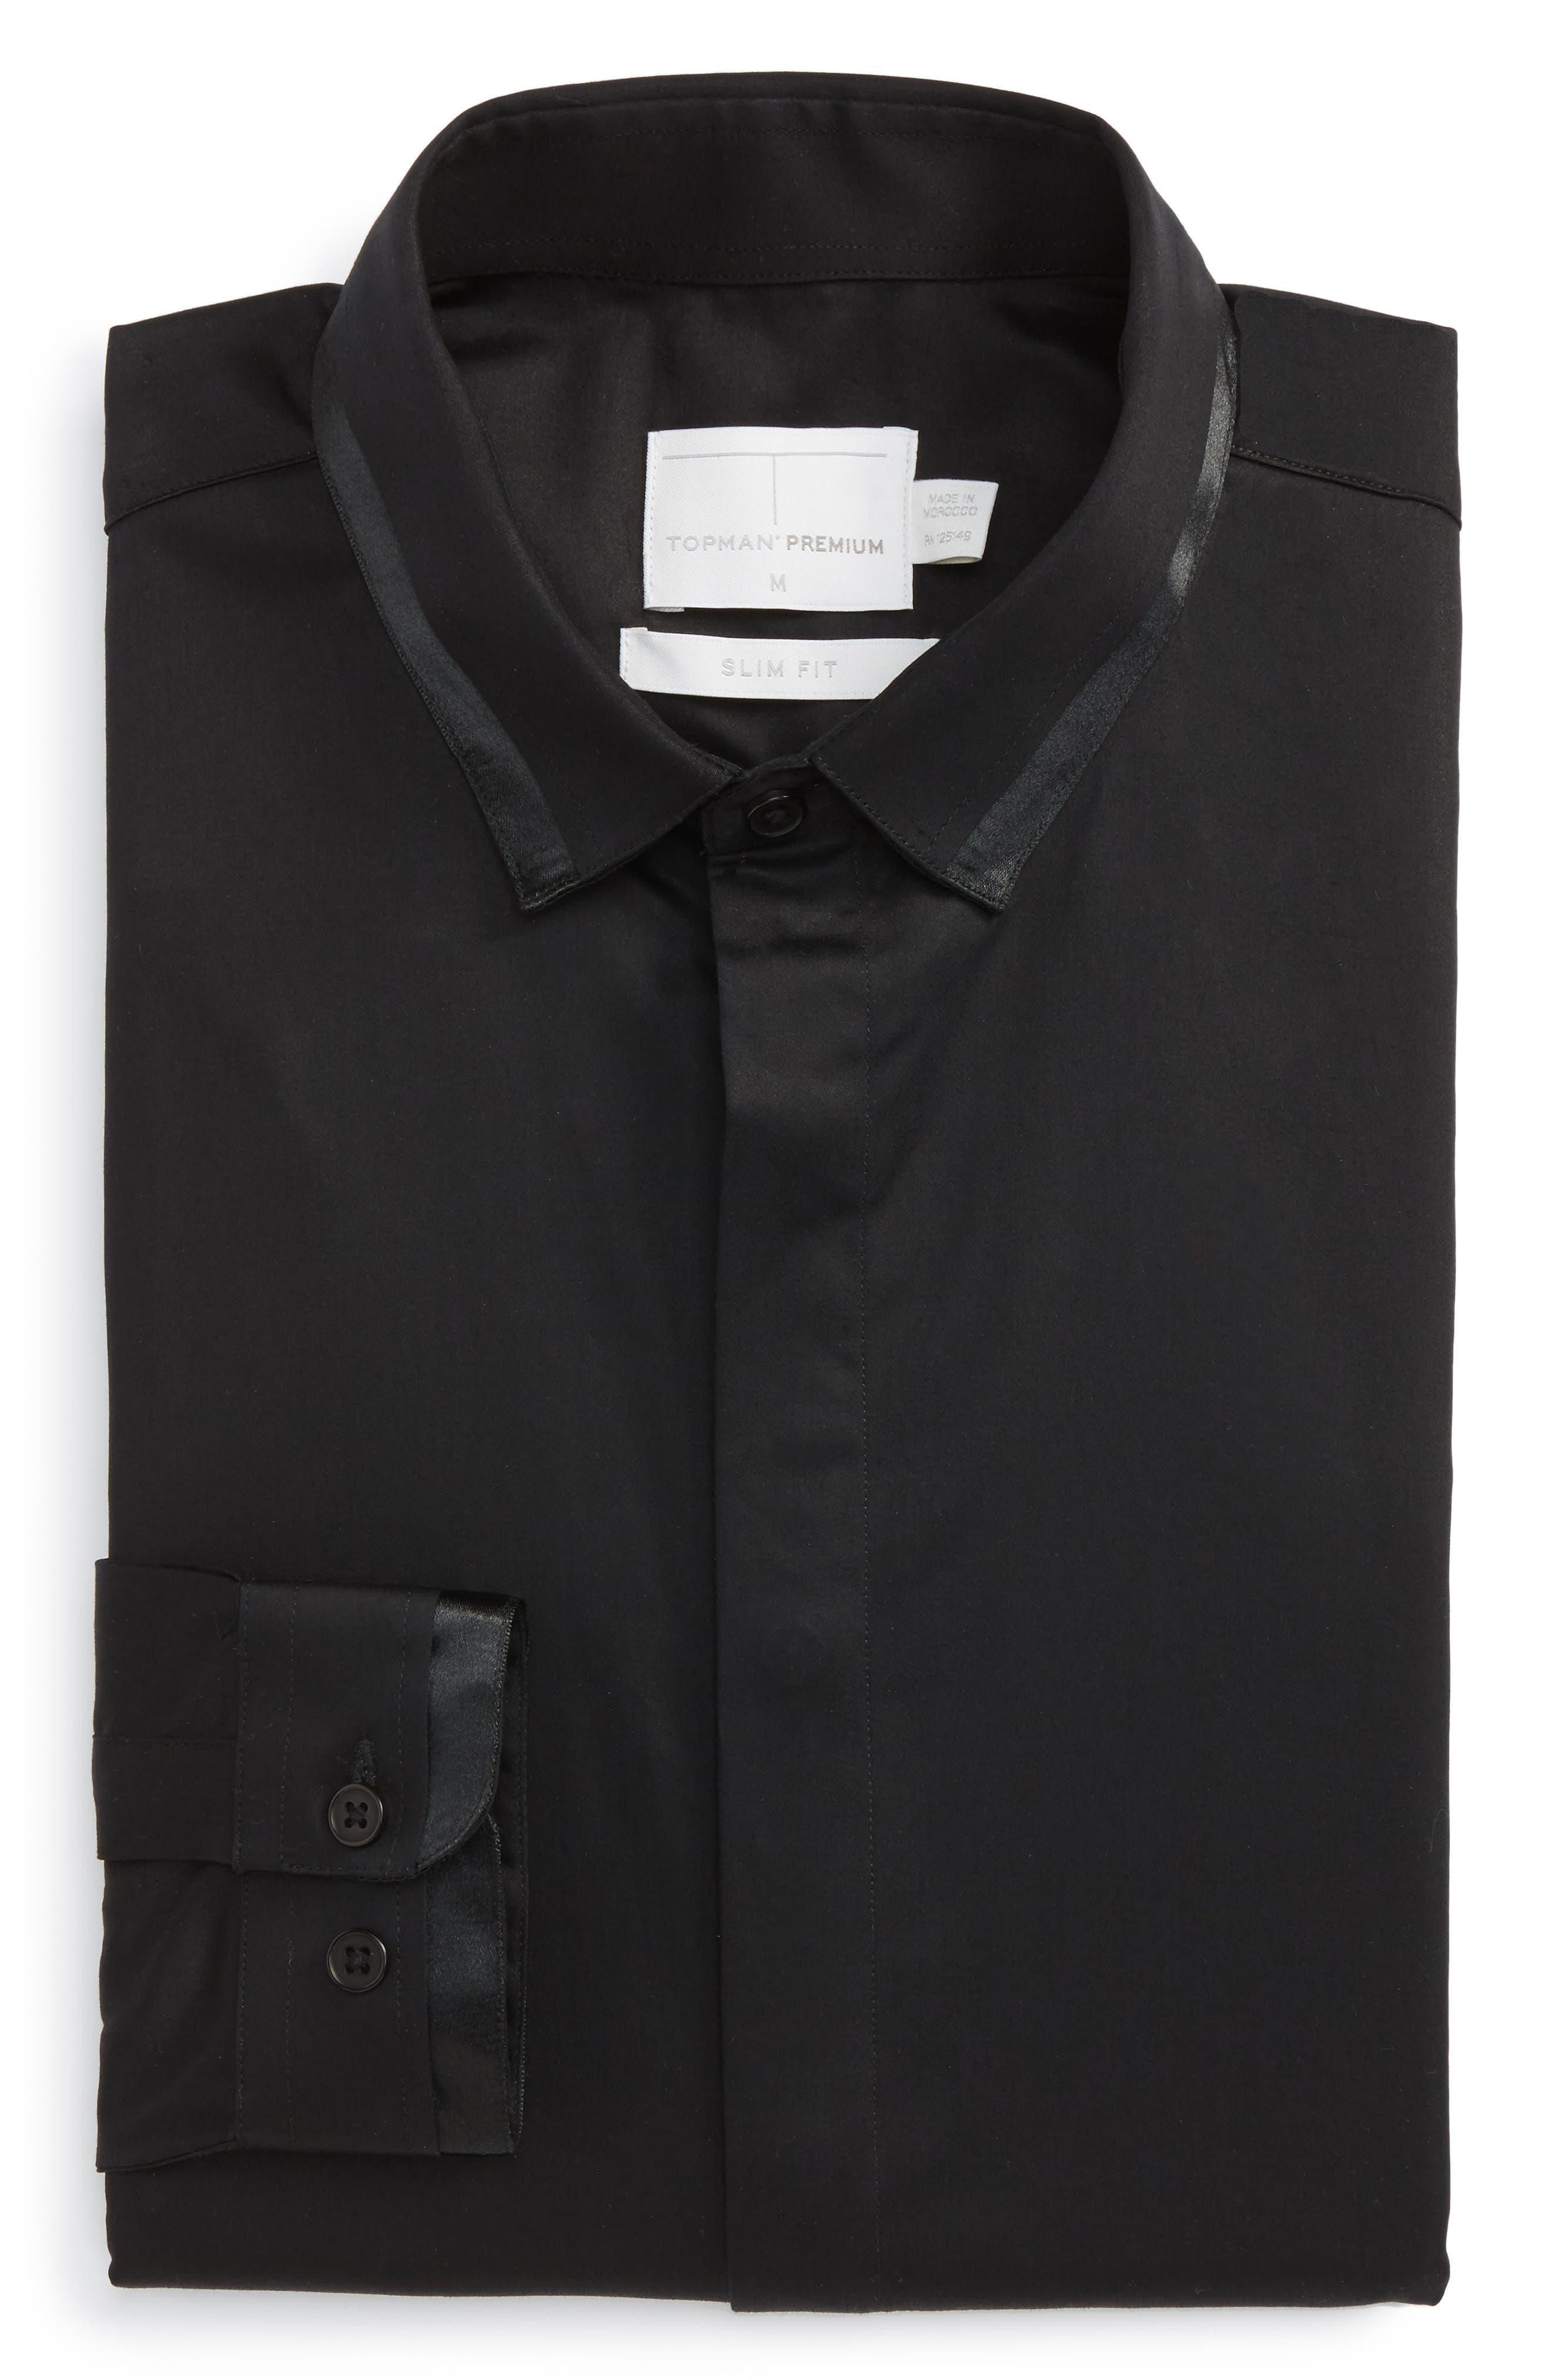 Alternate Image 1 Selected - Topman Satin Trim Woven Shirt